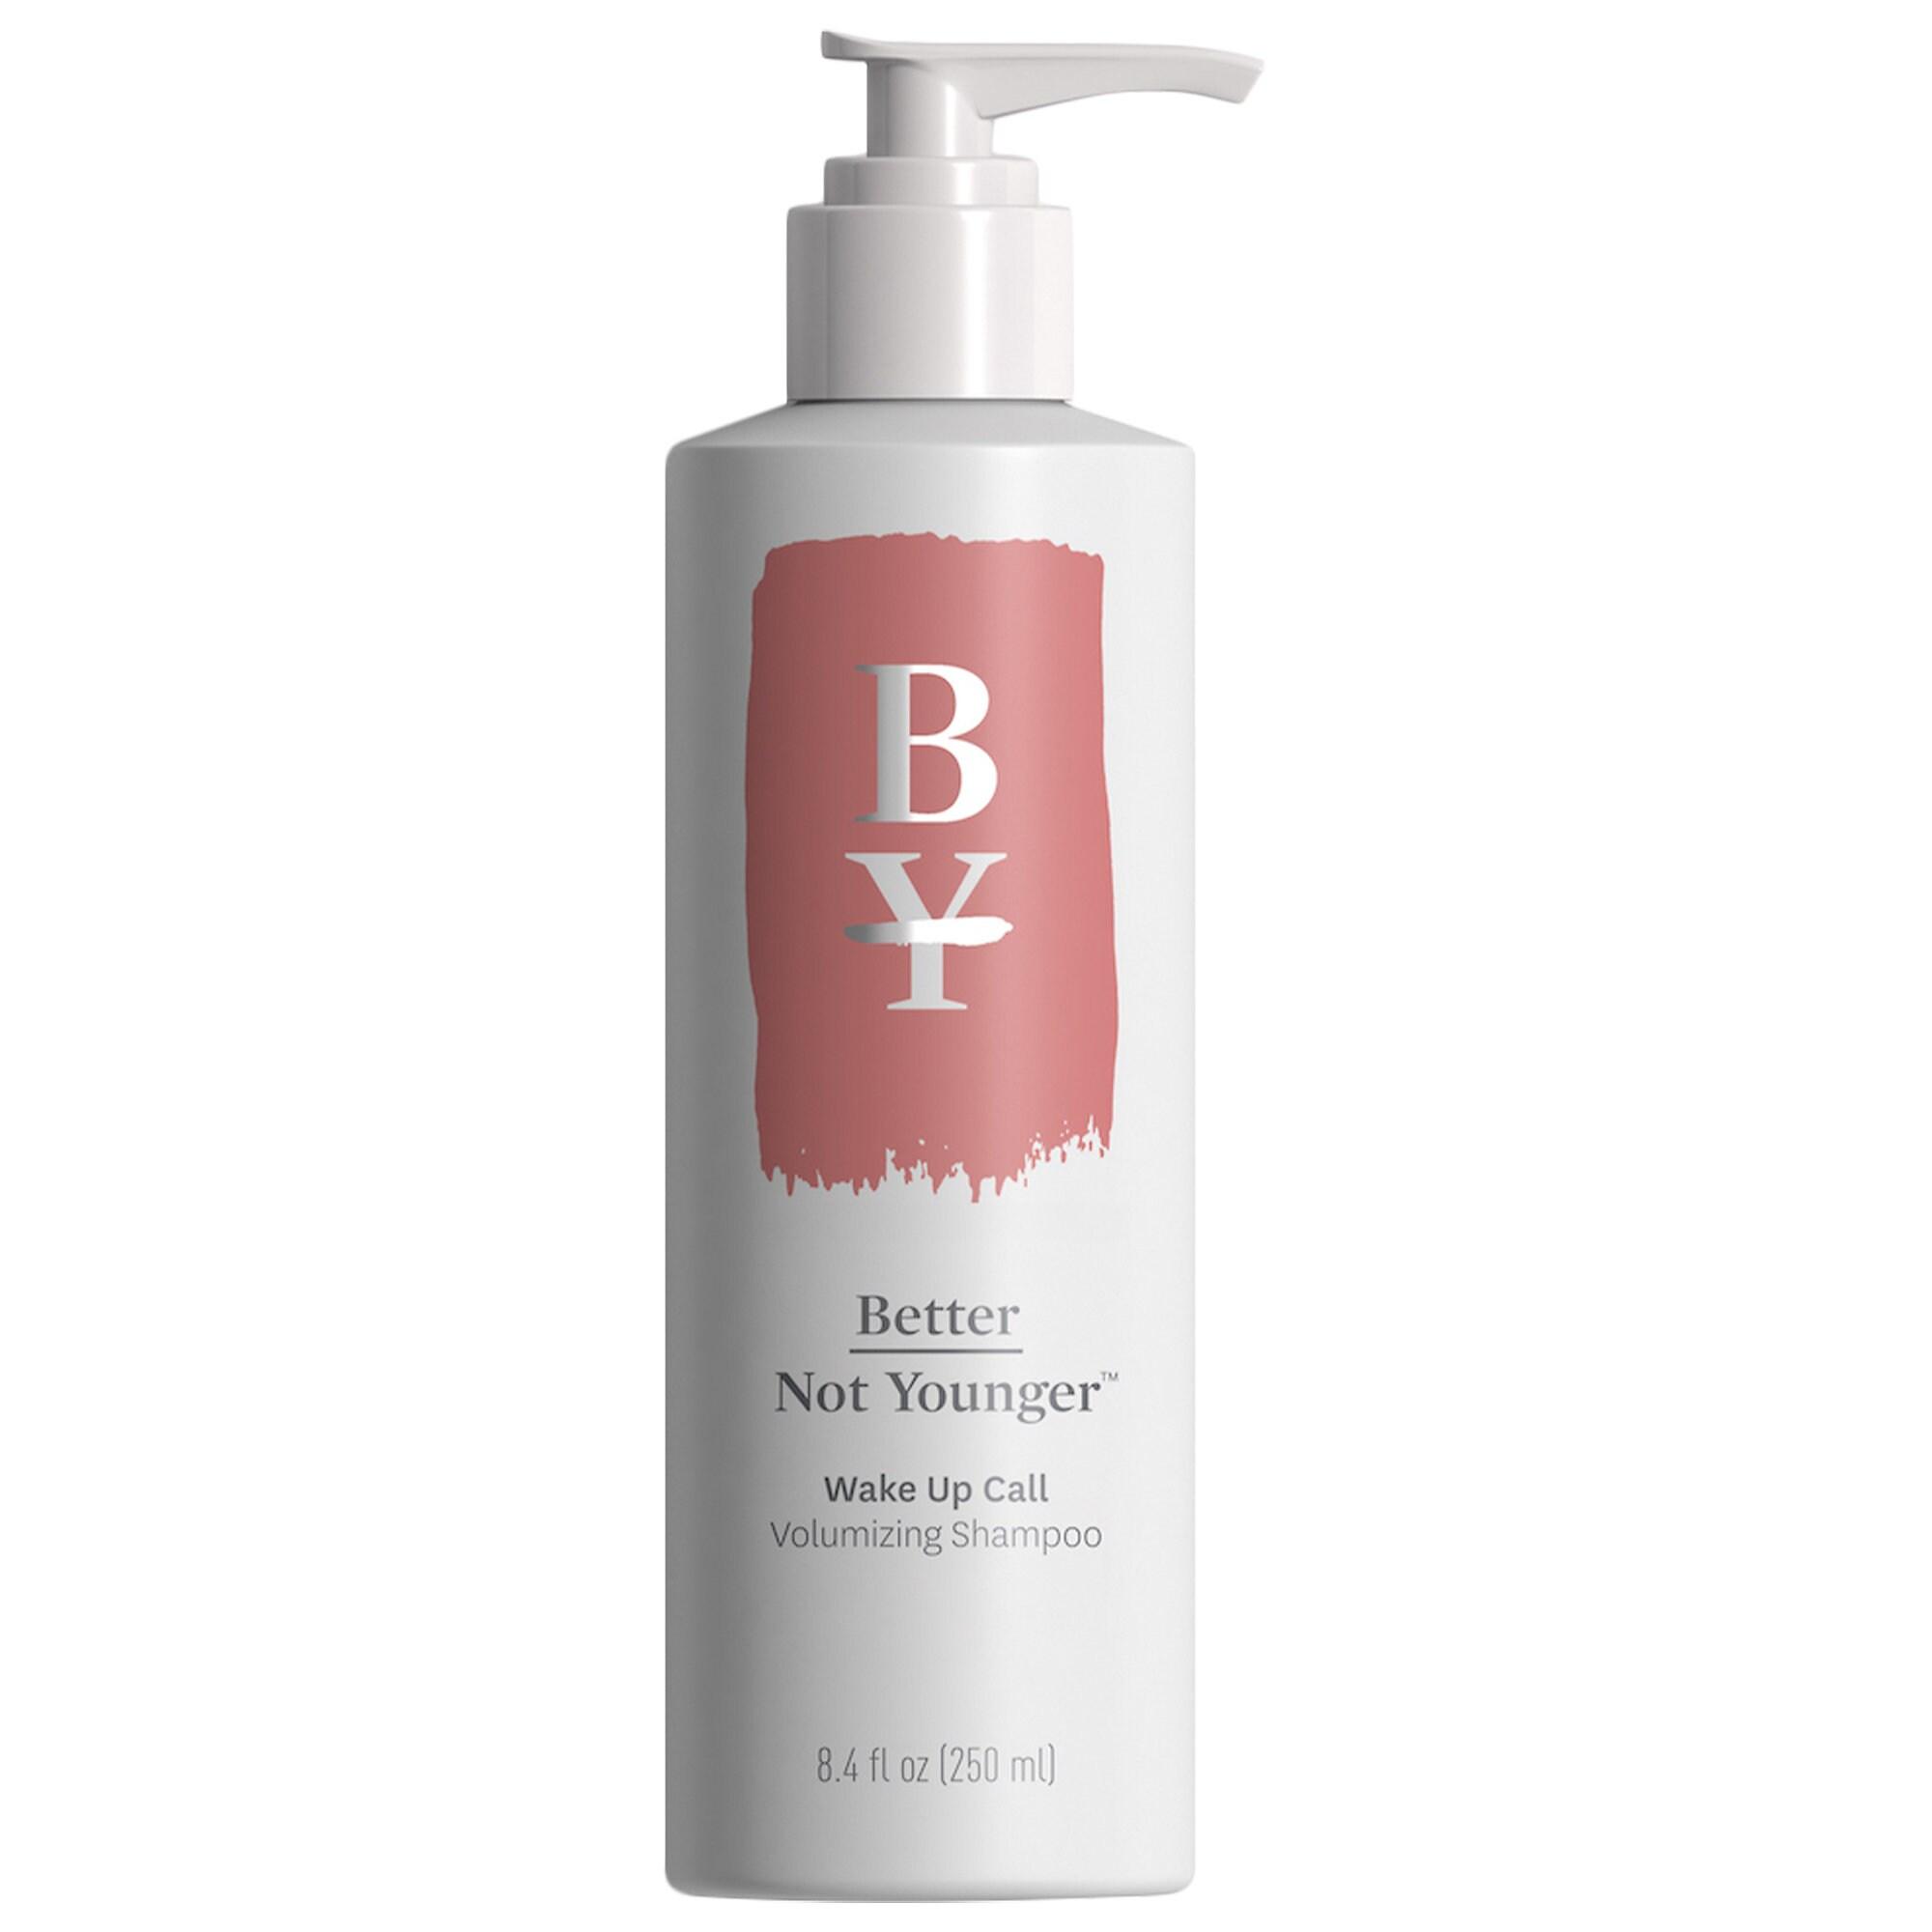 Better Not Younger - Wake Up Call Volumizing Shampoo